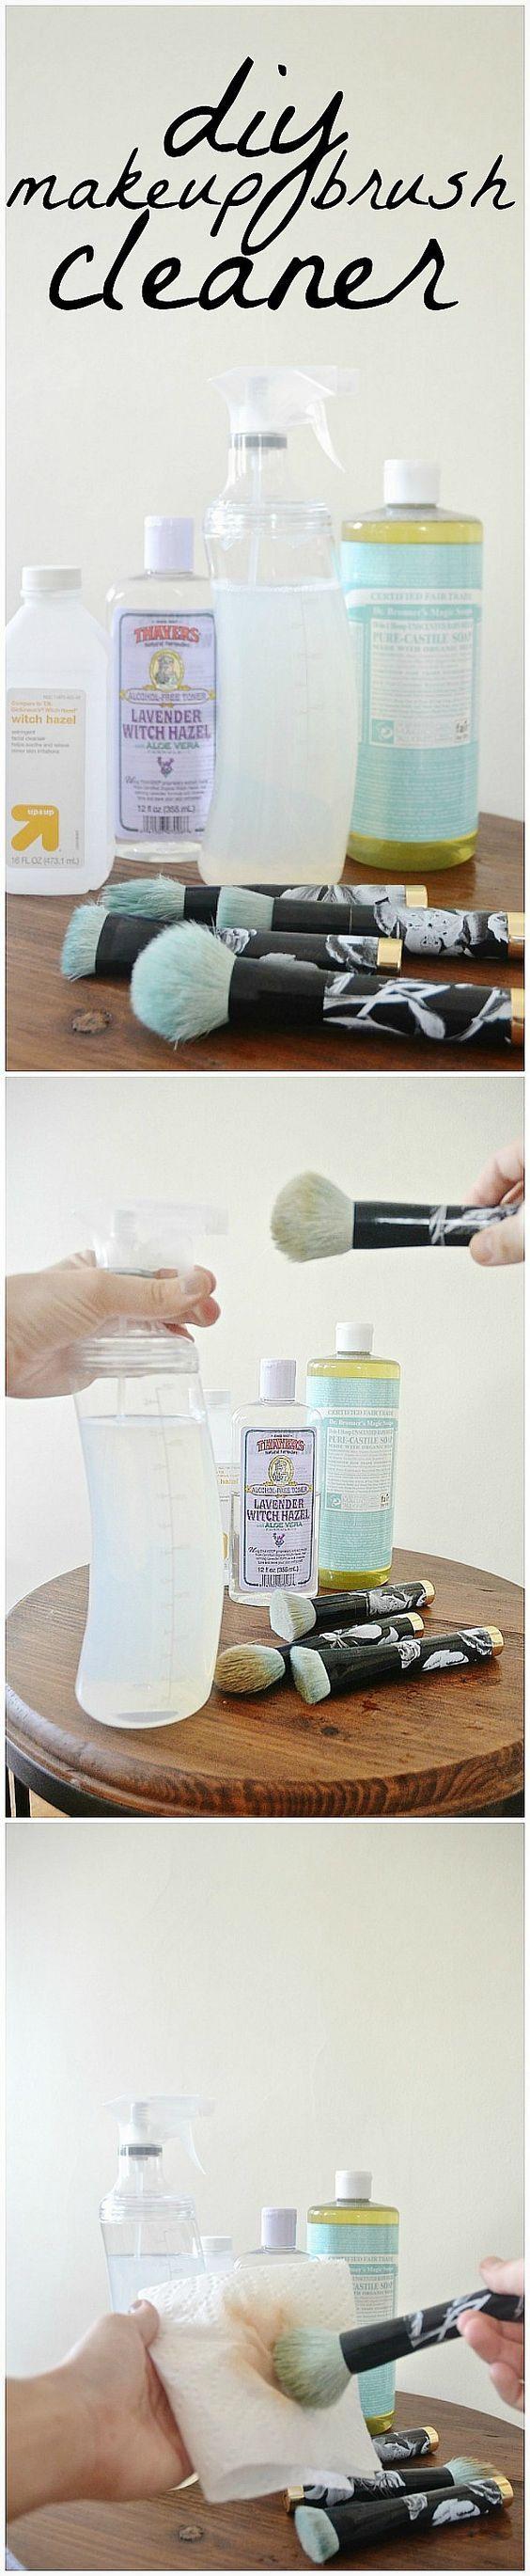 DIY Makeup Brush Cleaner Diy makeup brush, Diy makeup